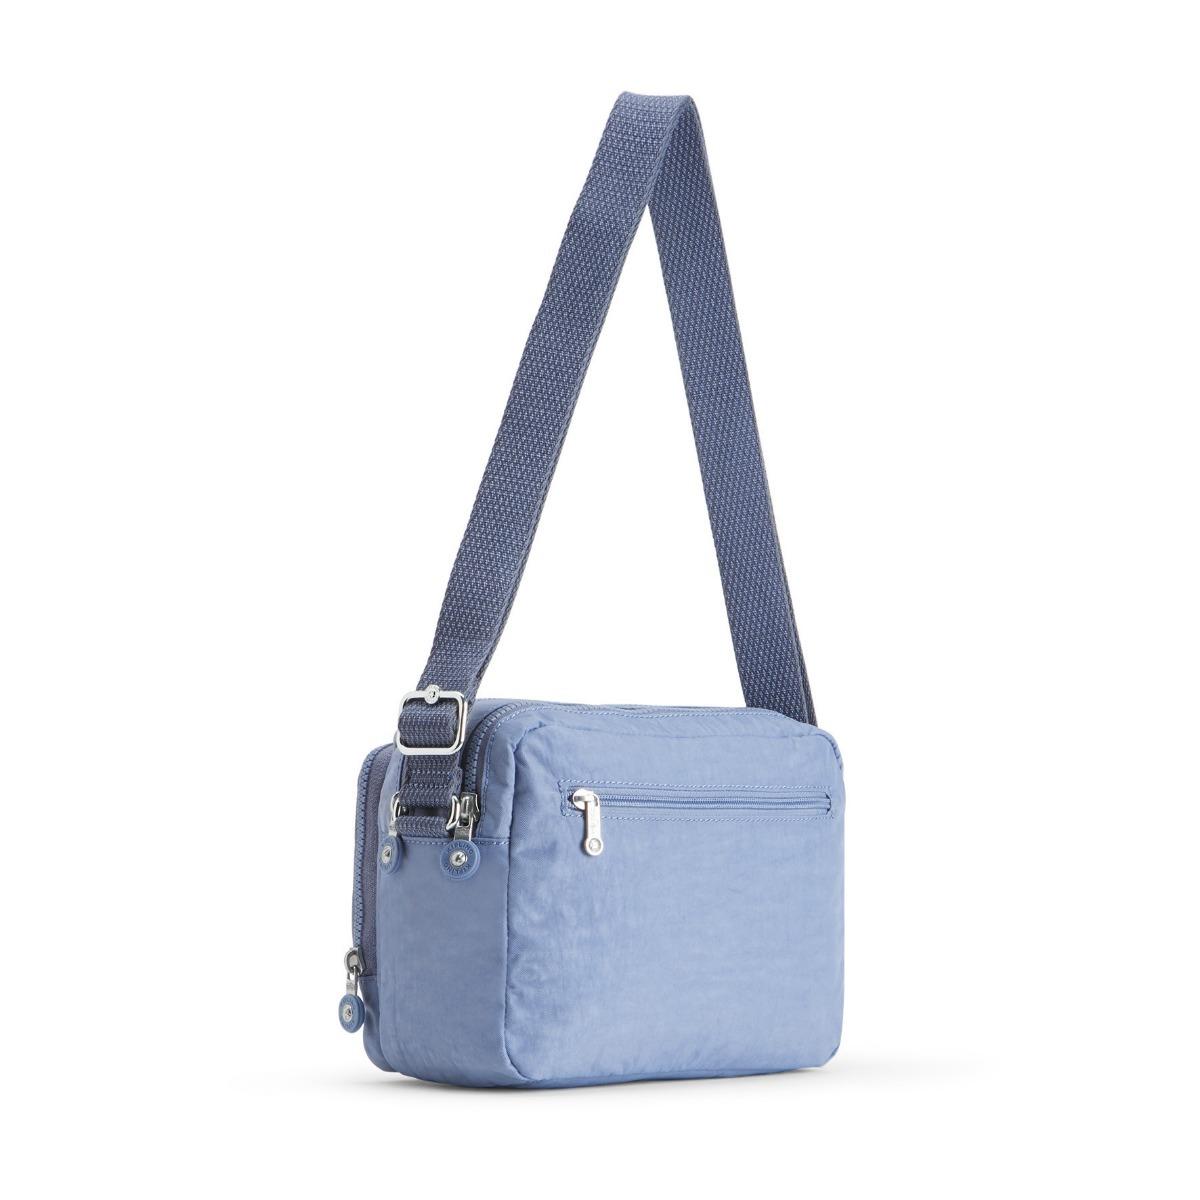 64eb08e95 Bolsa Kipling Silen Timid Blue C - R$ 699,00 em Mercado Livre